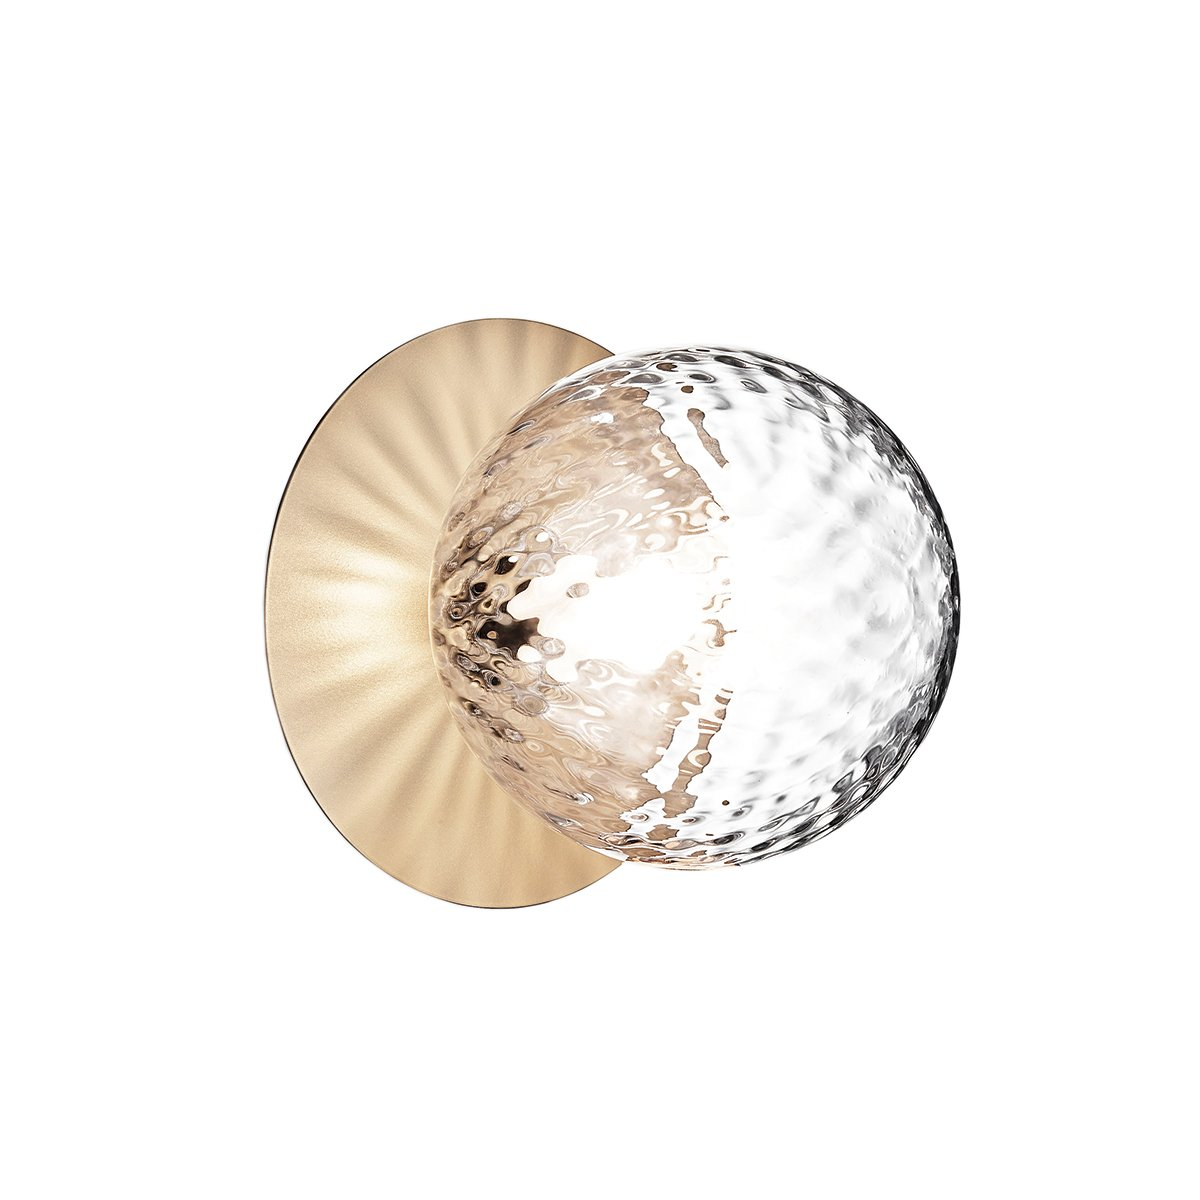 Nuura Liila 1 Wand- & Plafondlamp